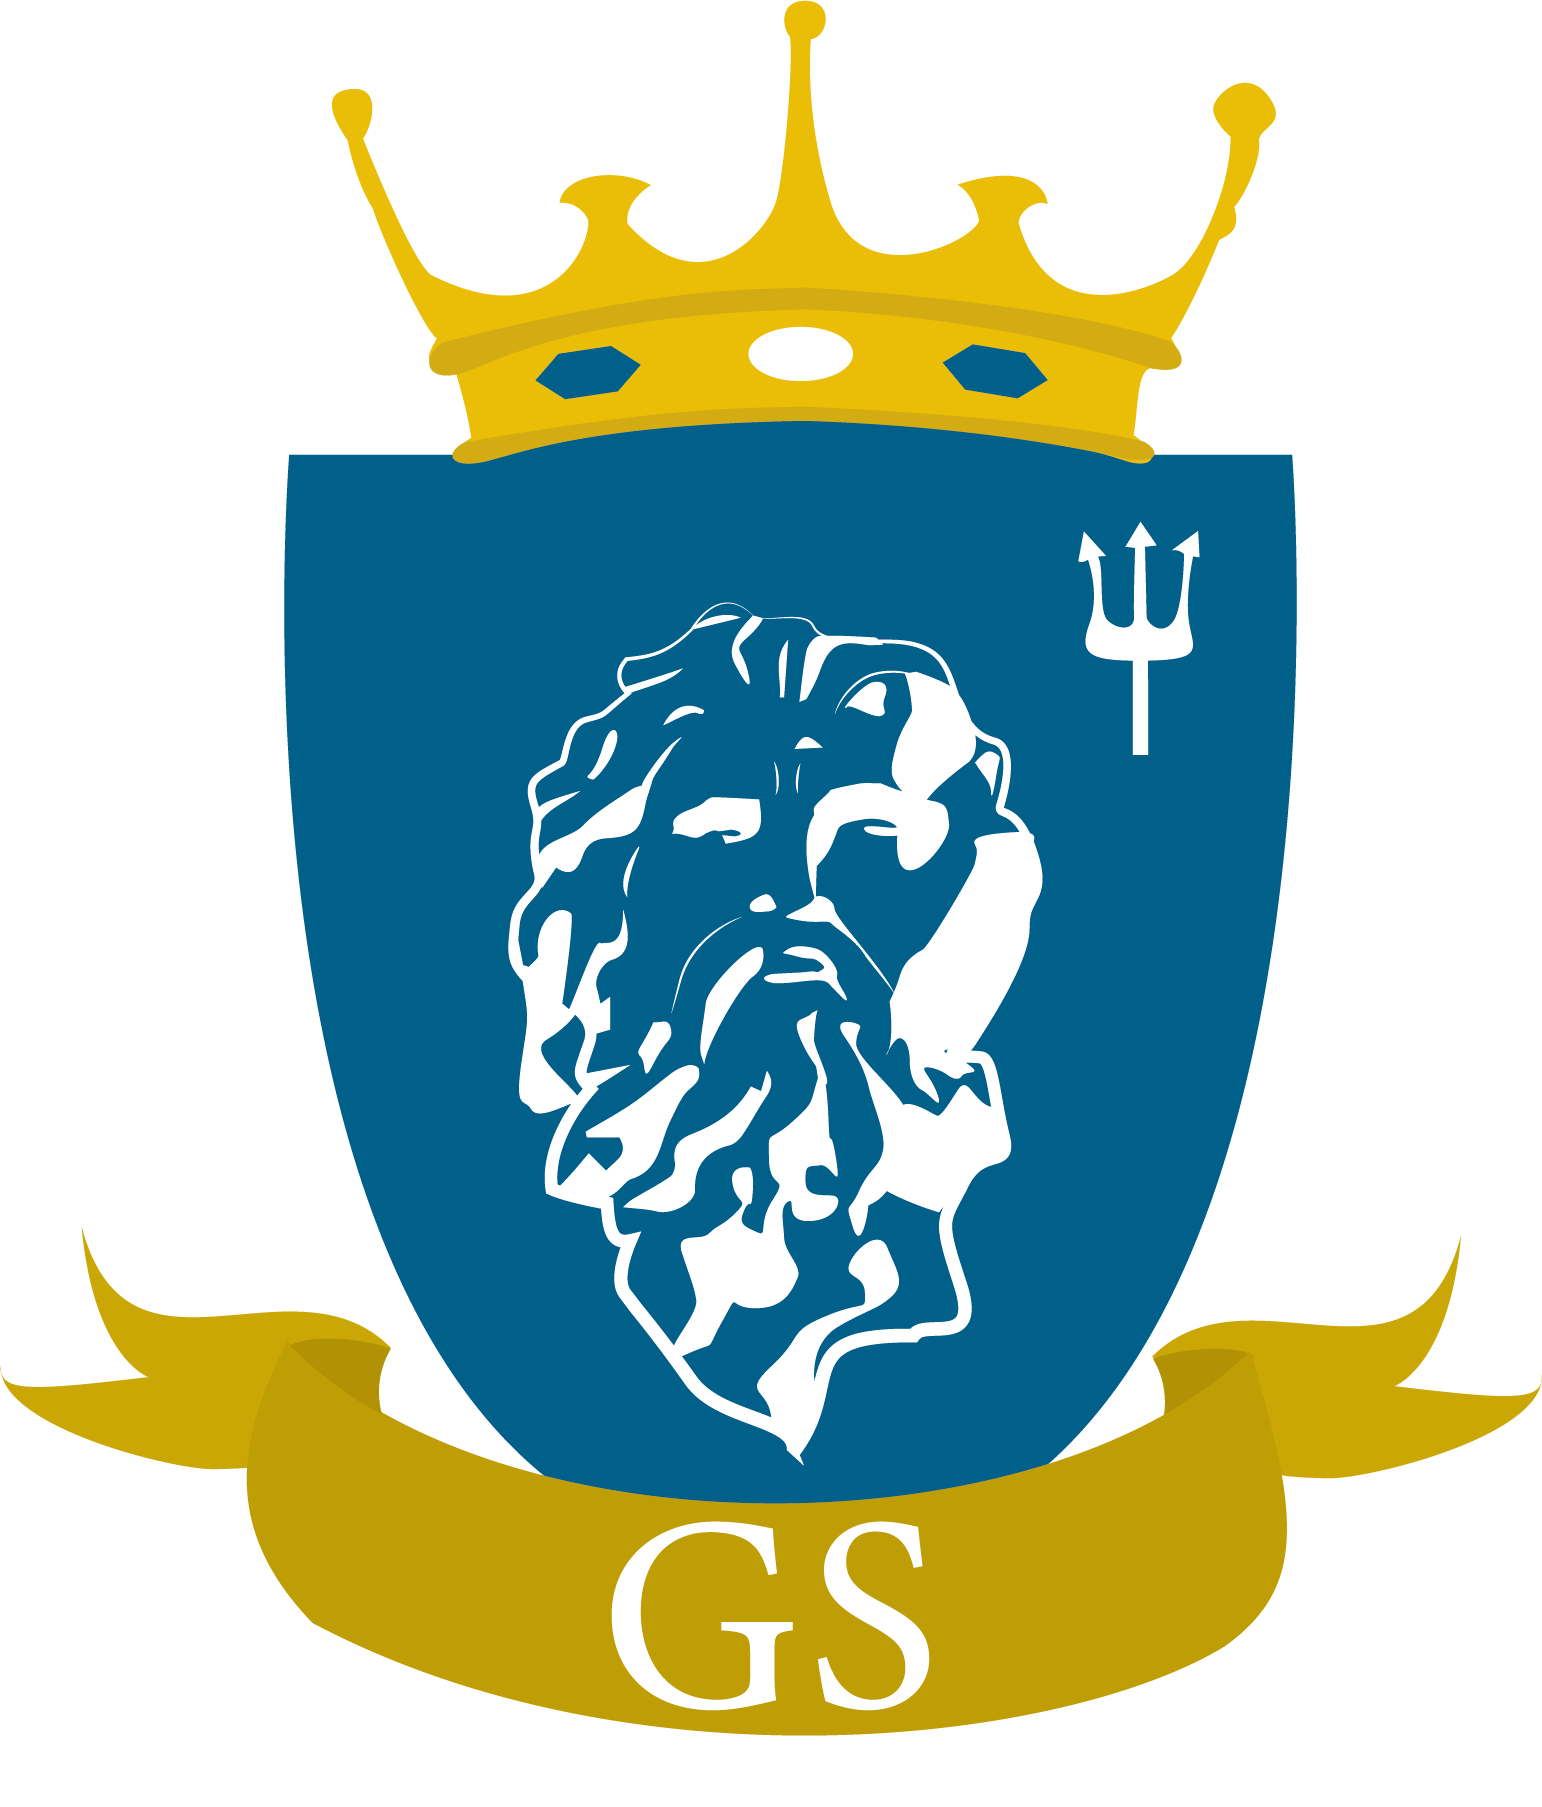 GS Ship Supply & Services